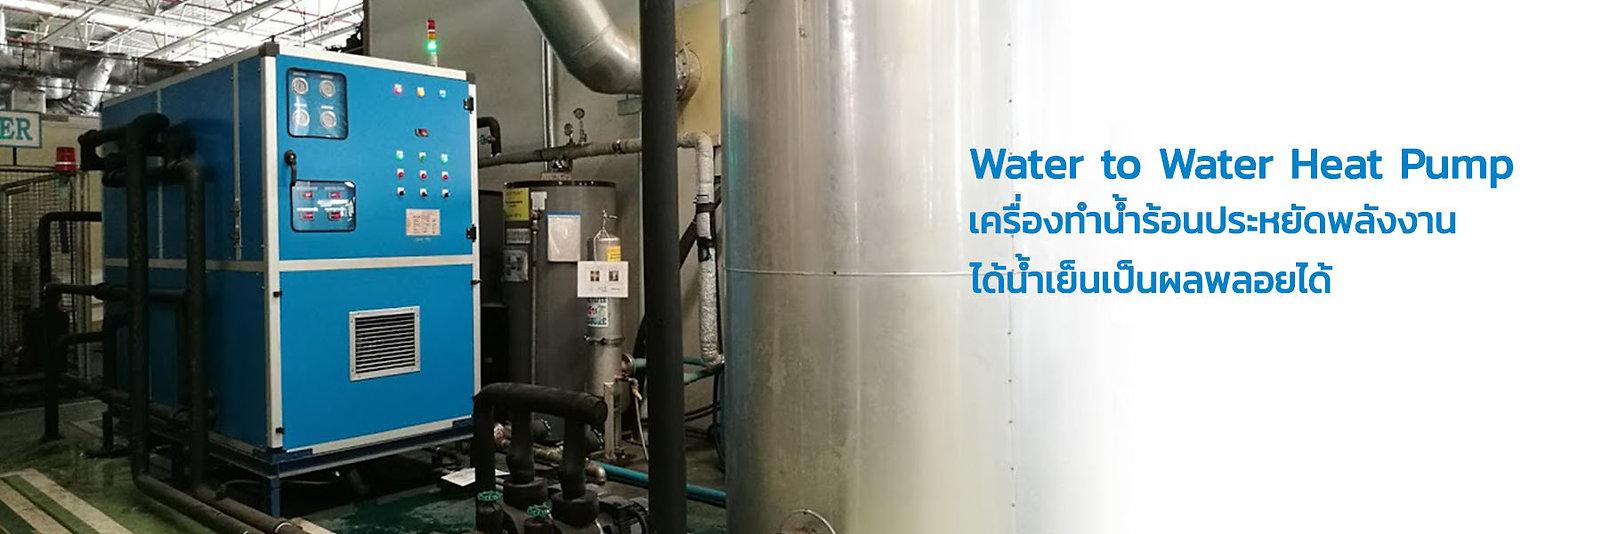 Water to Water.jpg